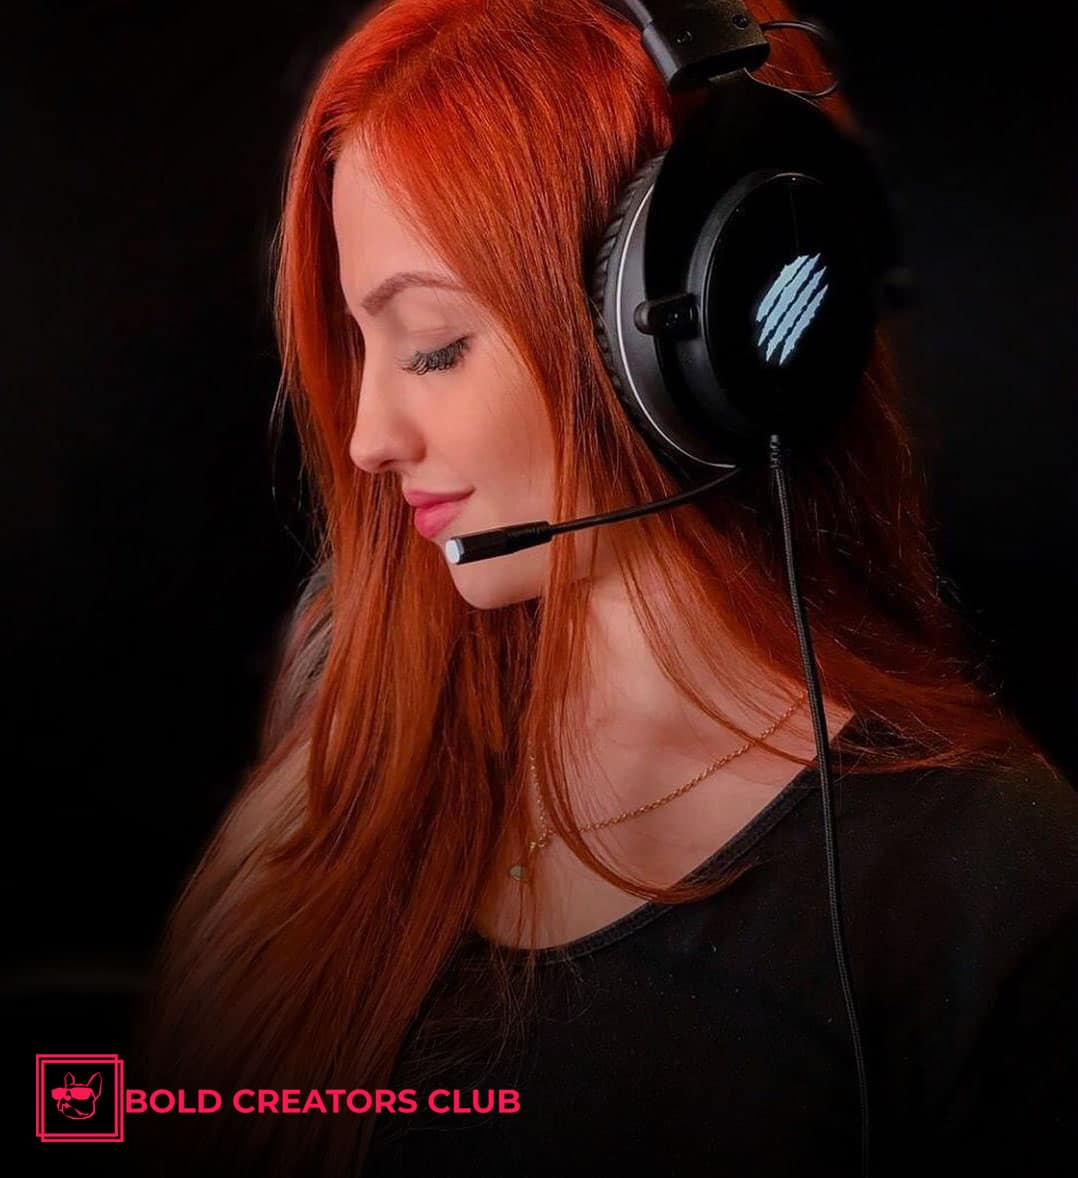 Alice Gobbi Bold Creators Club Influencer Marketing Agency South America Brazil